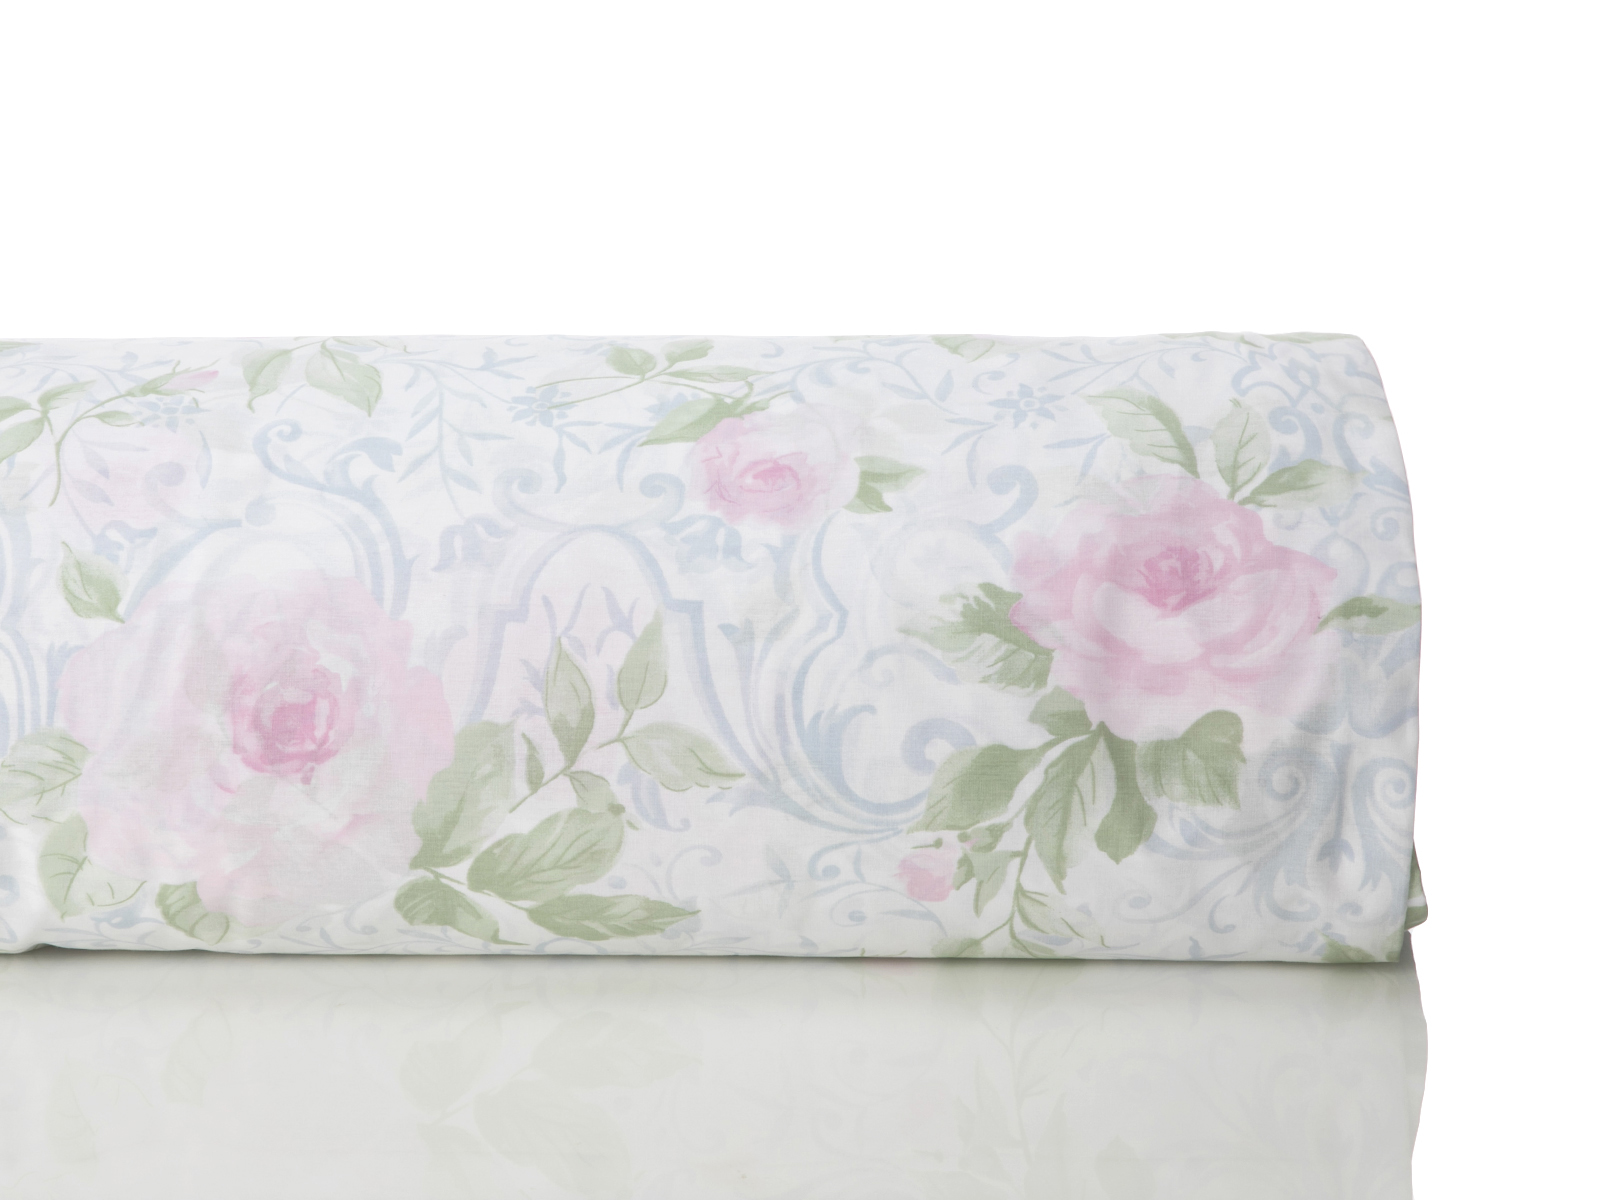 Rose Bed Pamuklu King Size Nevresım 240x220 Cm Pembe